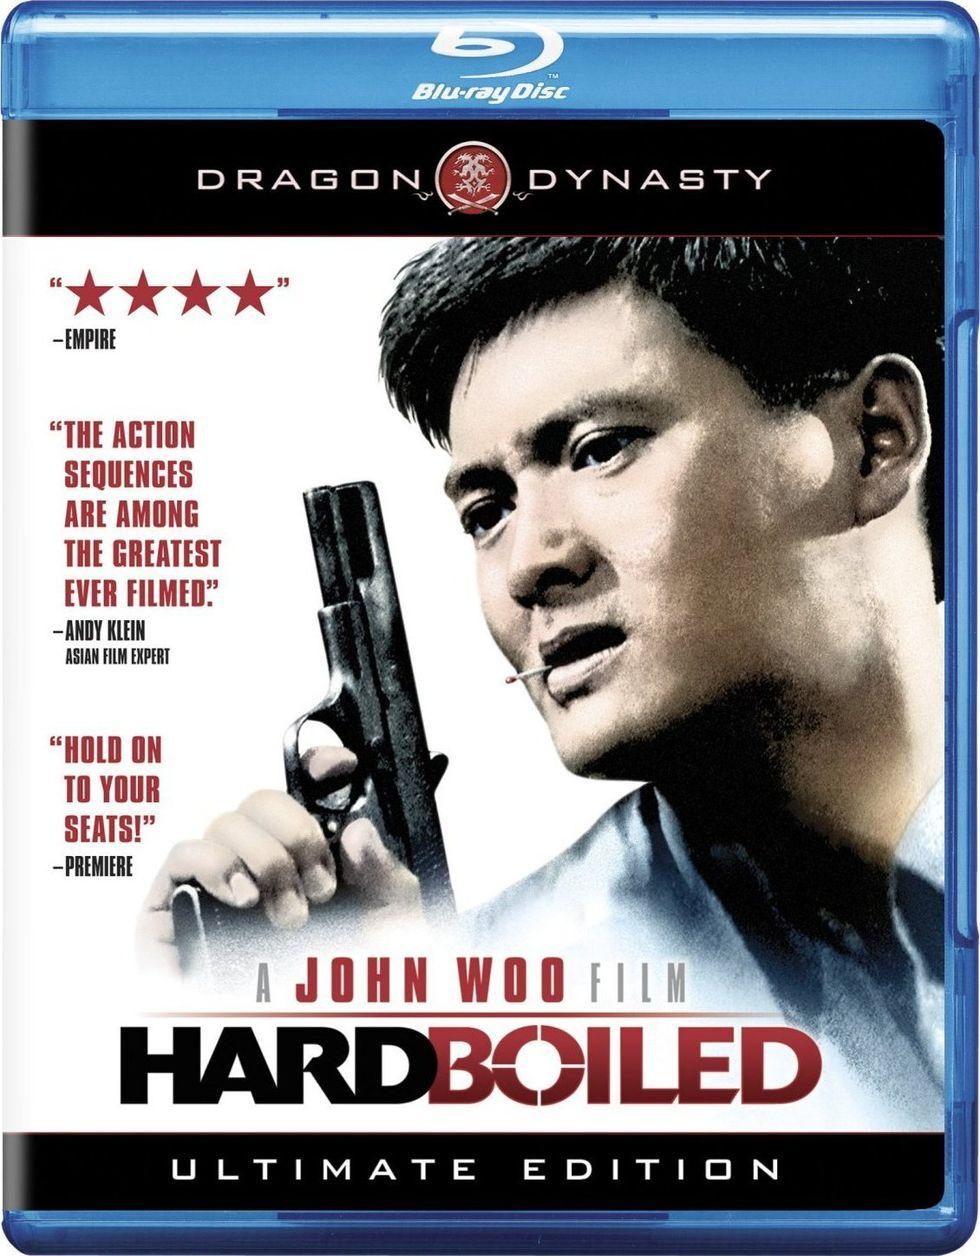 John Woo's Hard Boiled On Blu-ray